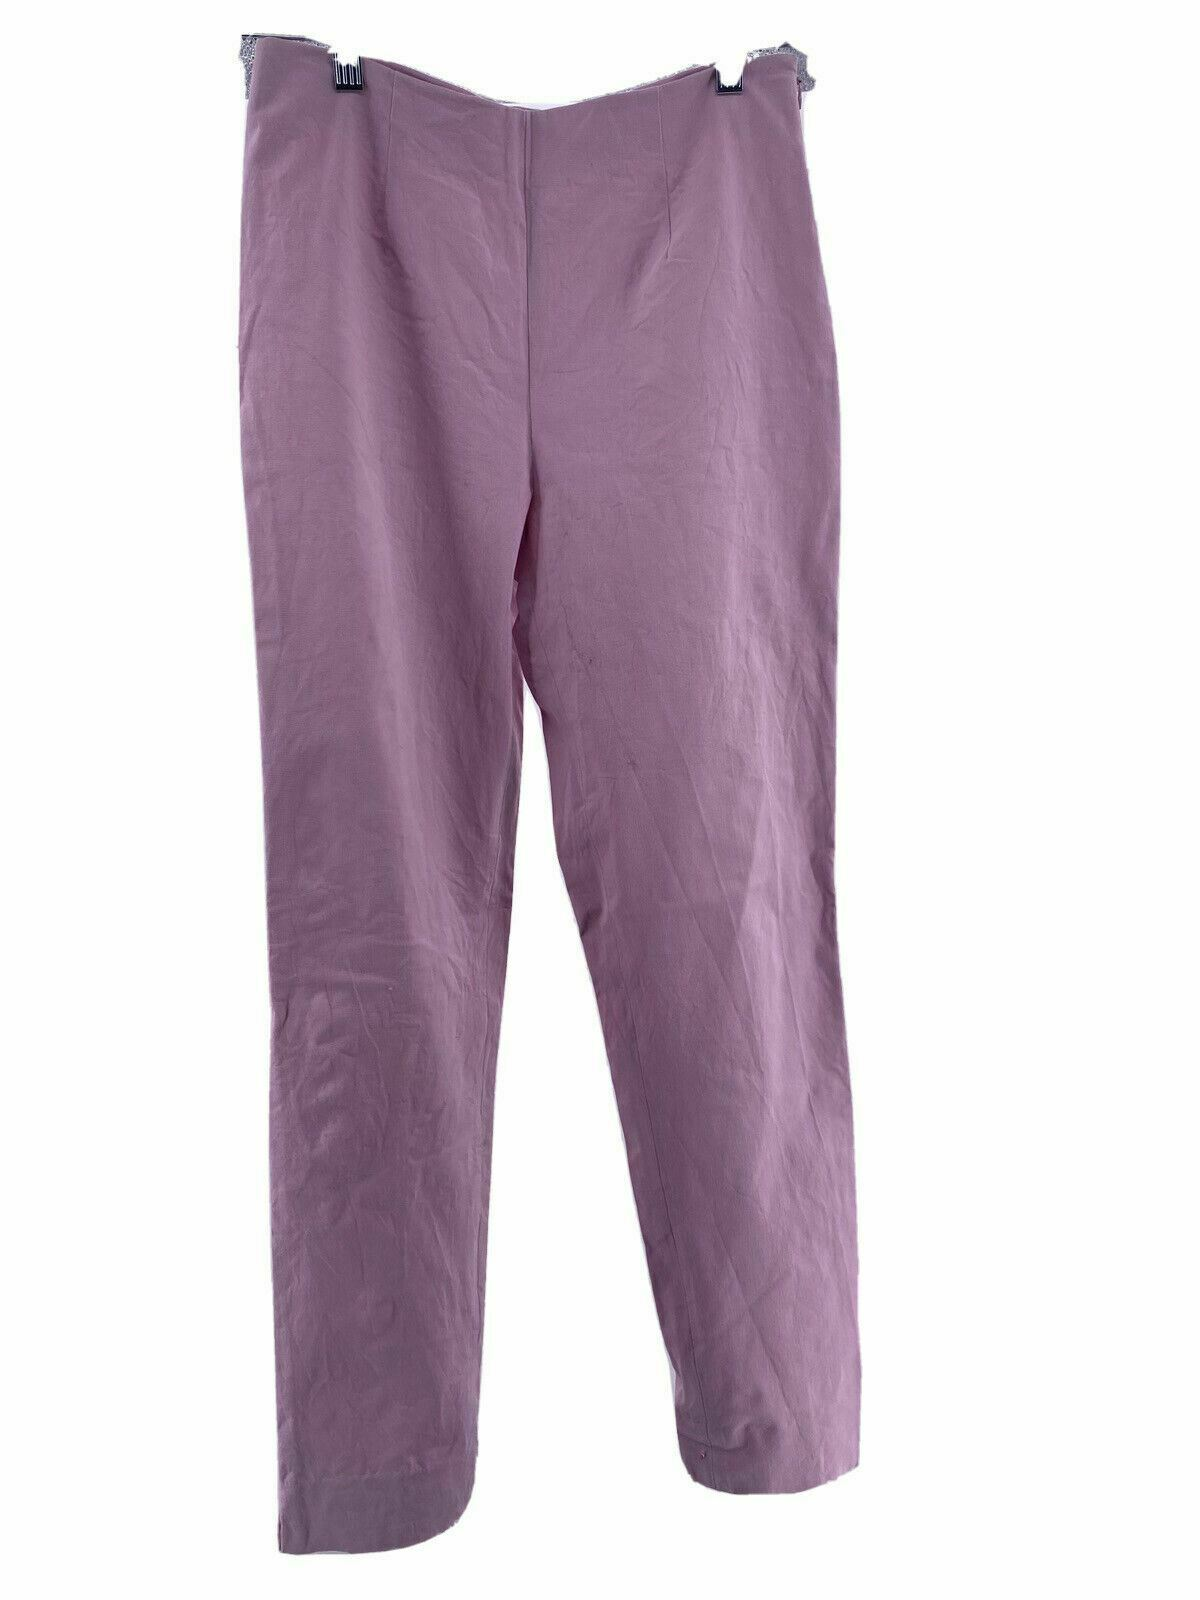 Leggiadro Womens Bubblegum Pink Pants Slacks - image 1